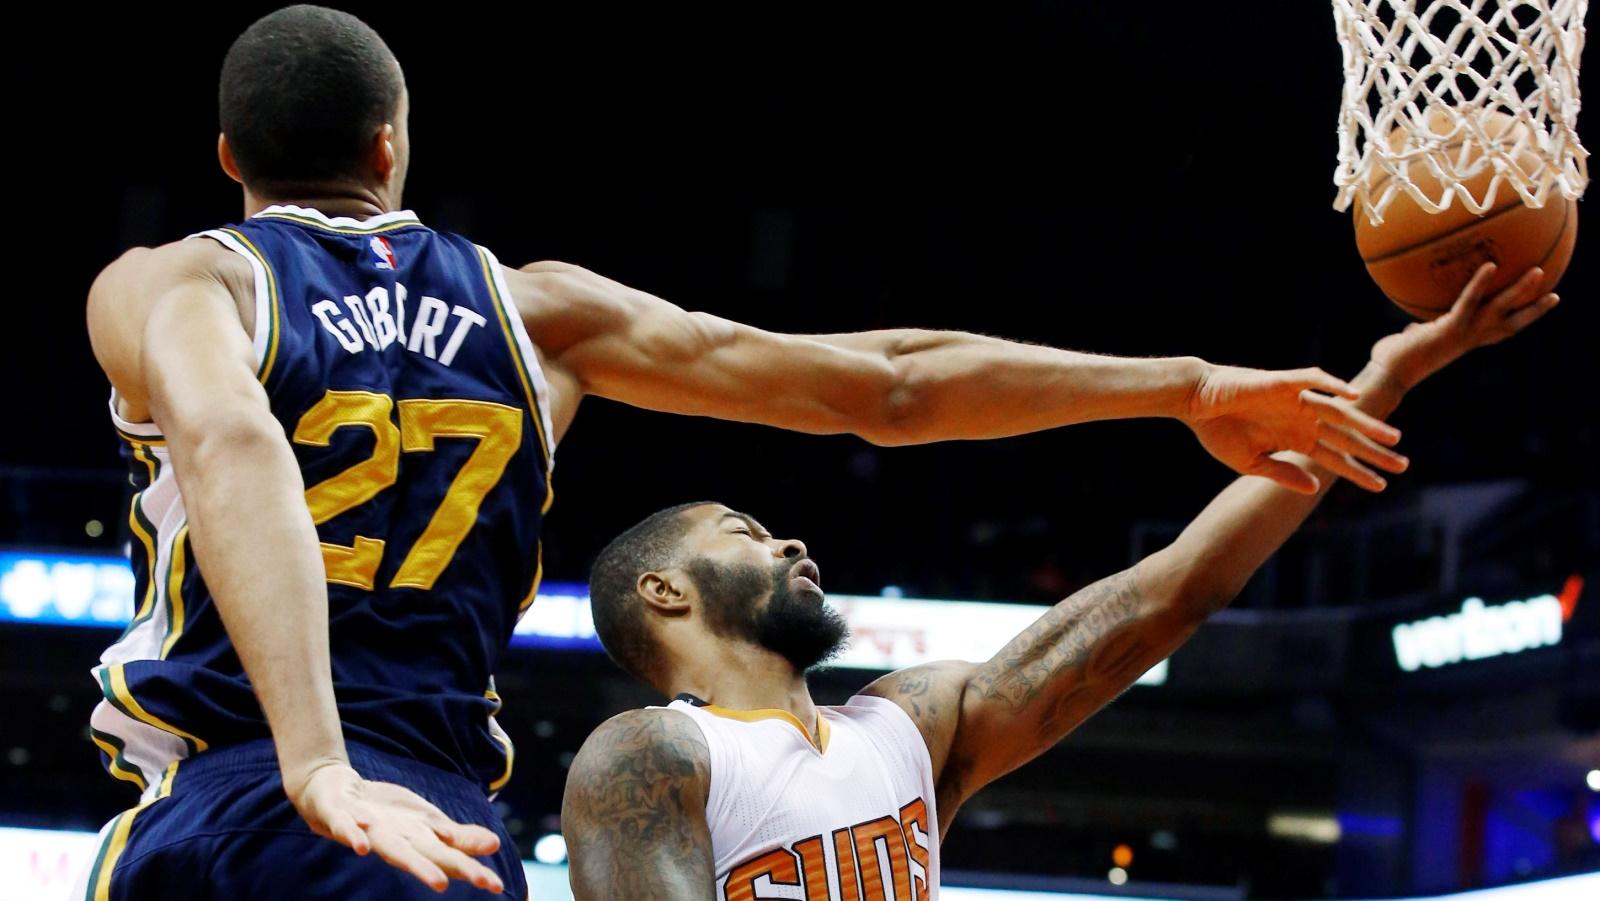 Len, Morris lead Suns to preseason win over Jazz